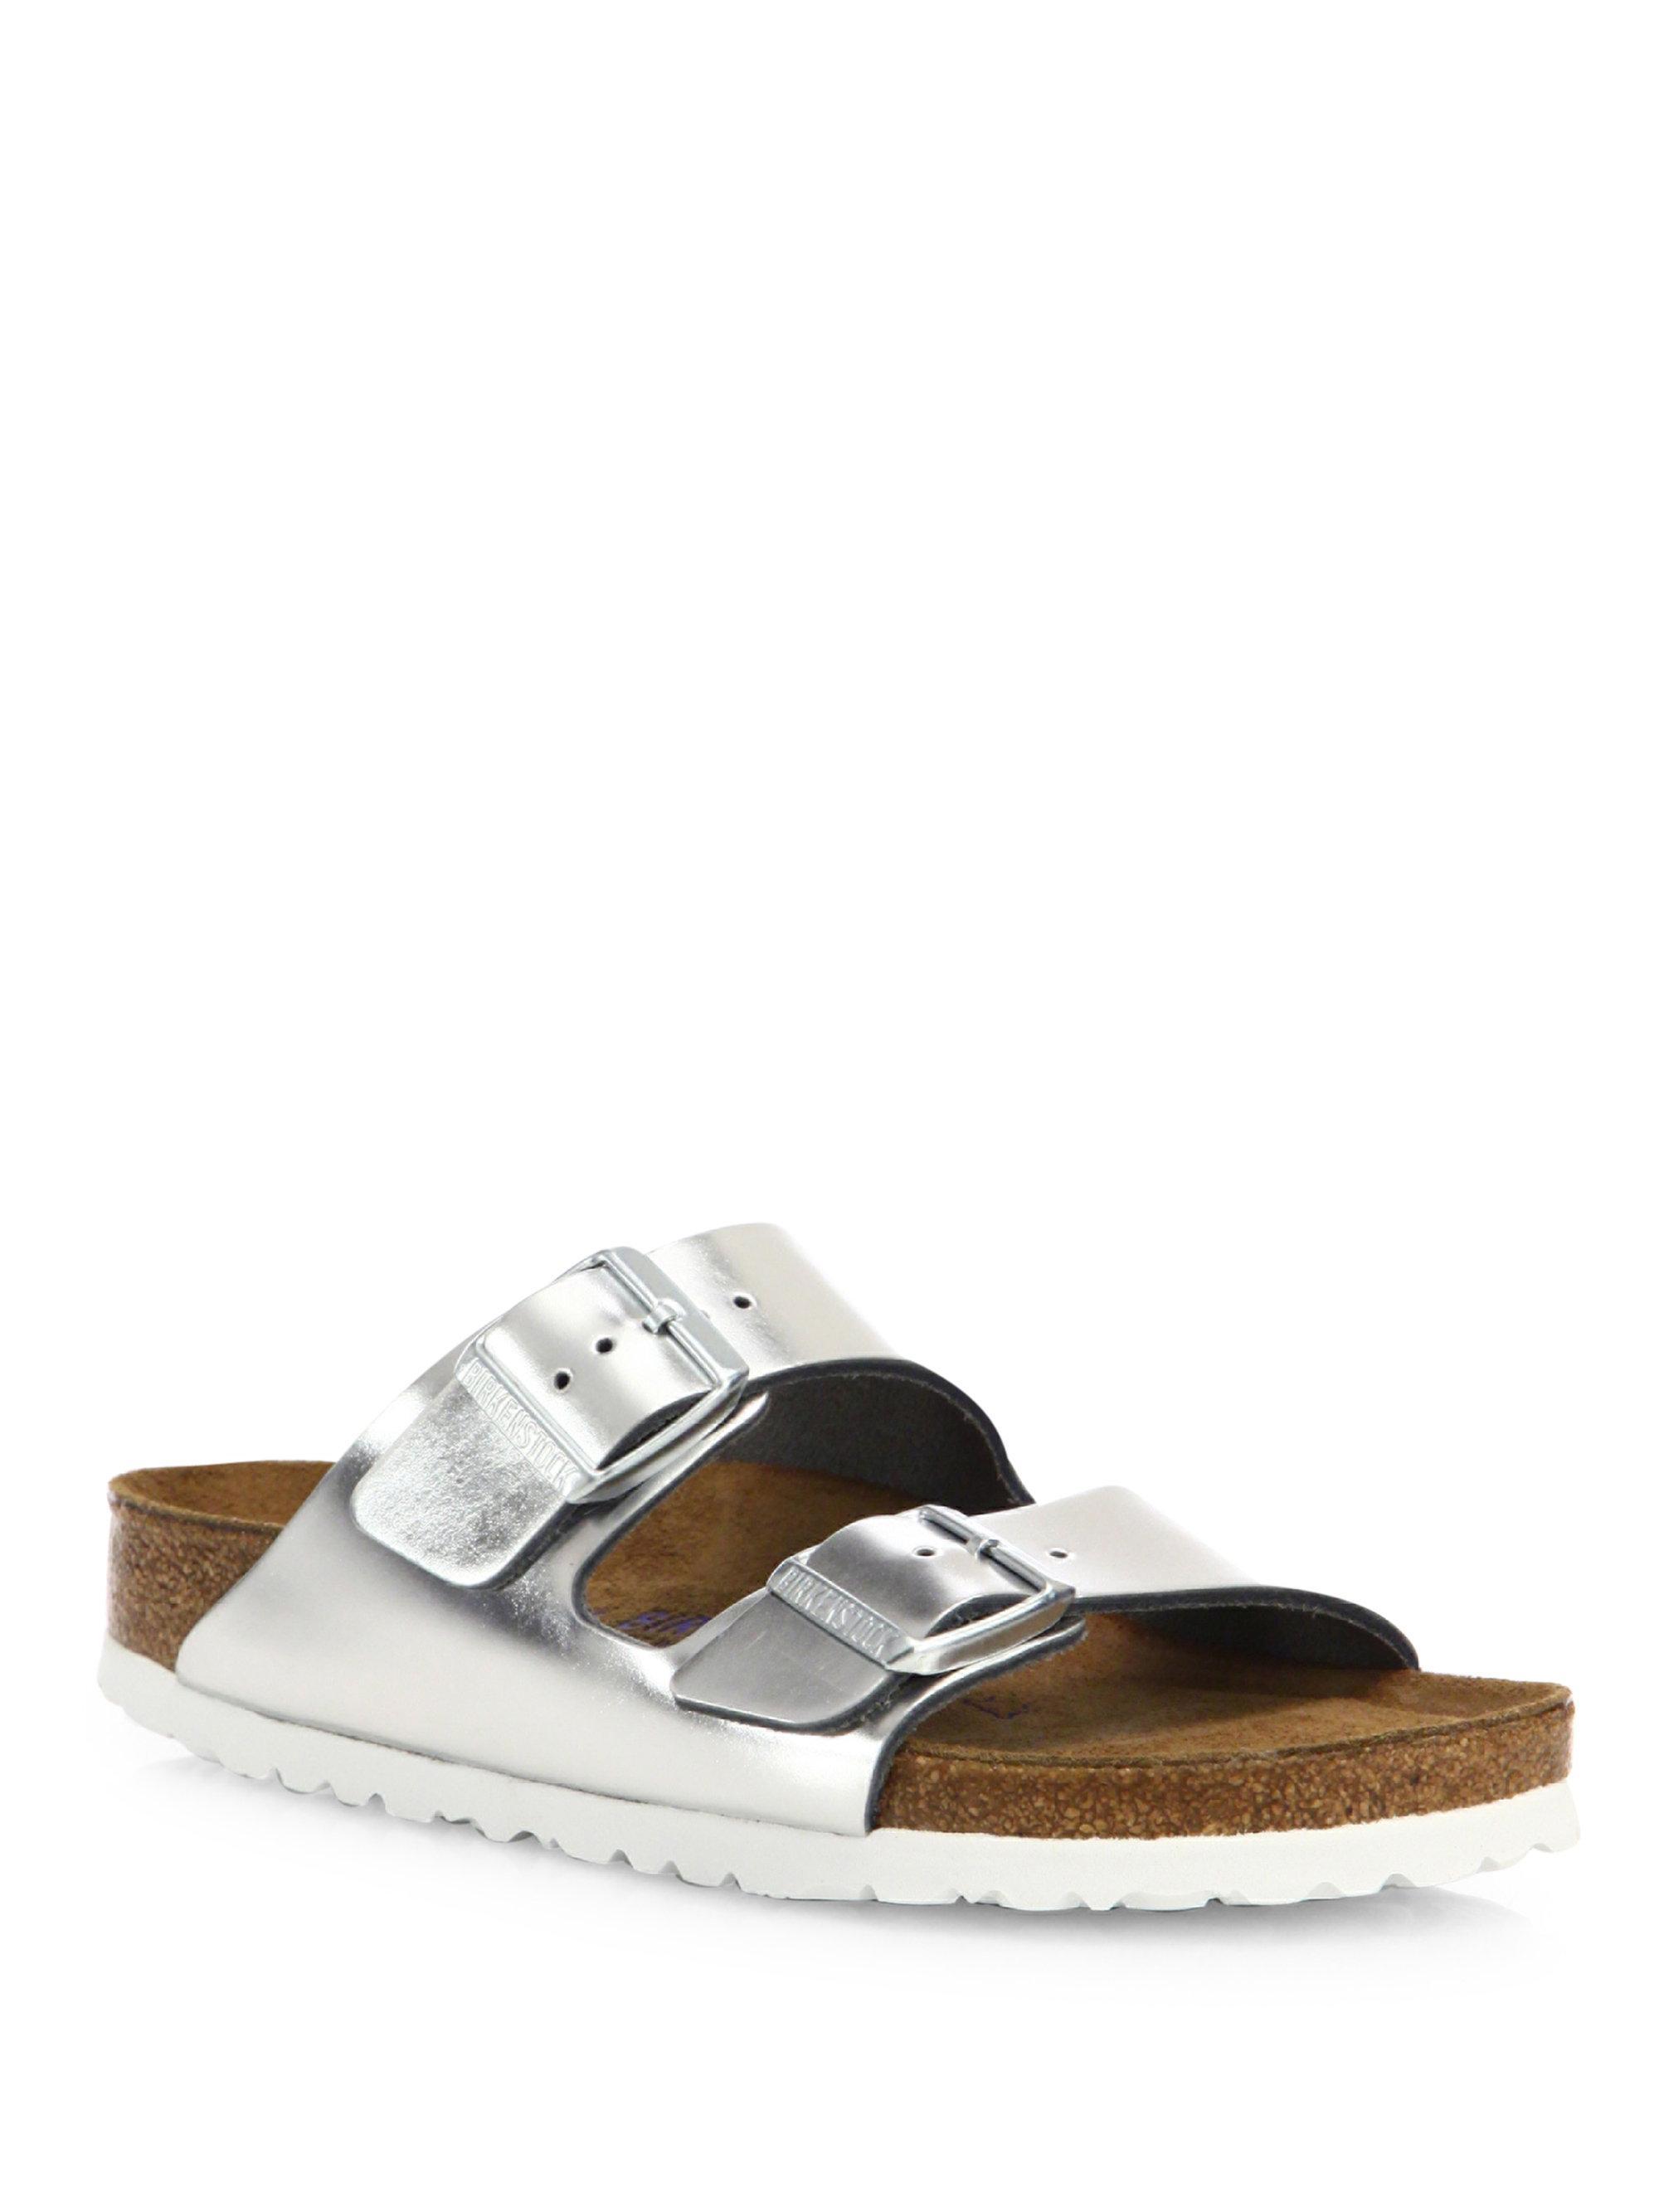 COqg8Ps9IH Arizona Metallic Leather Buckle Sandals Bo5OzME2C